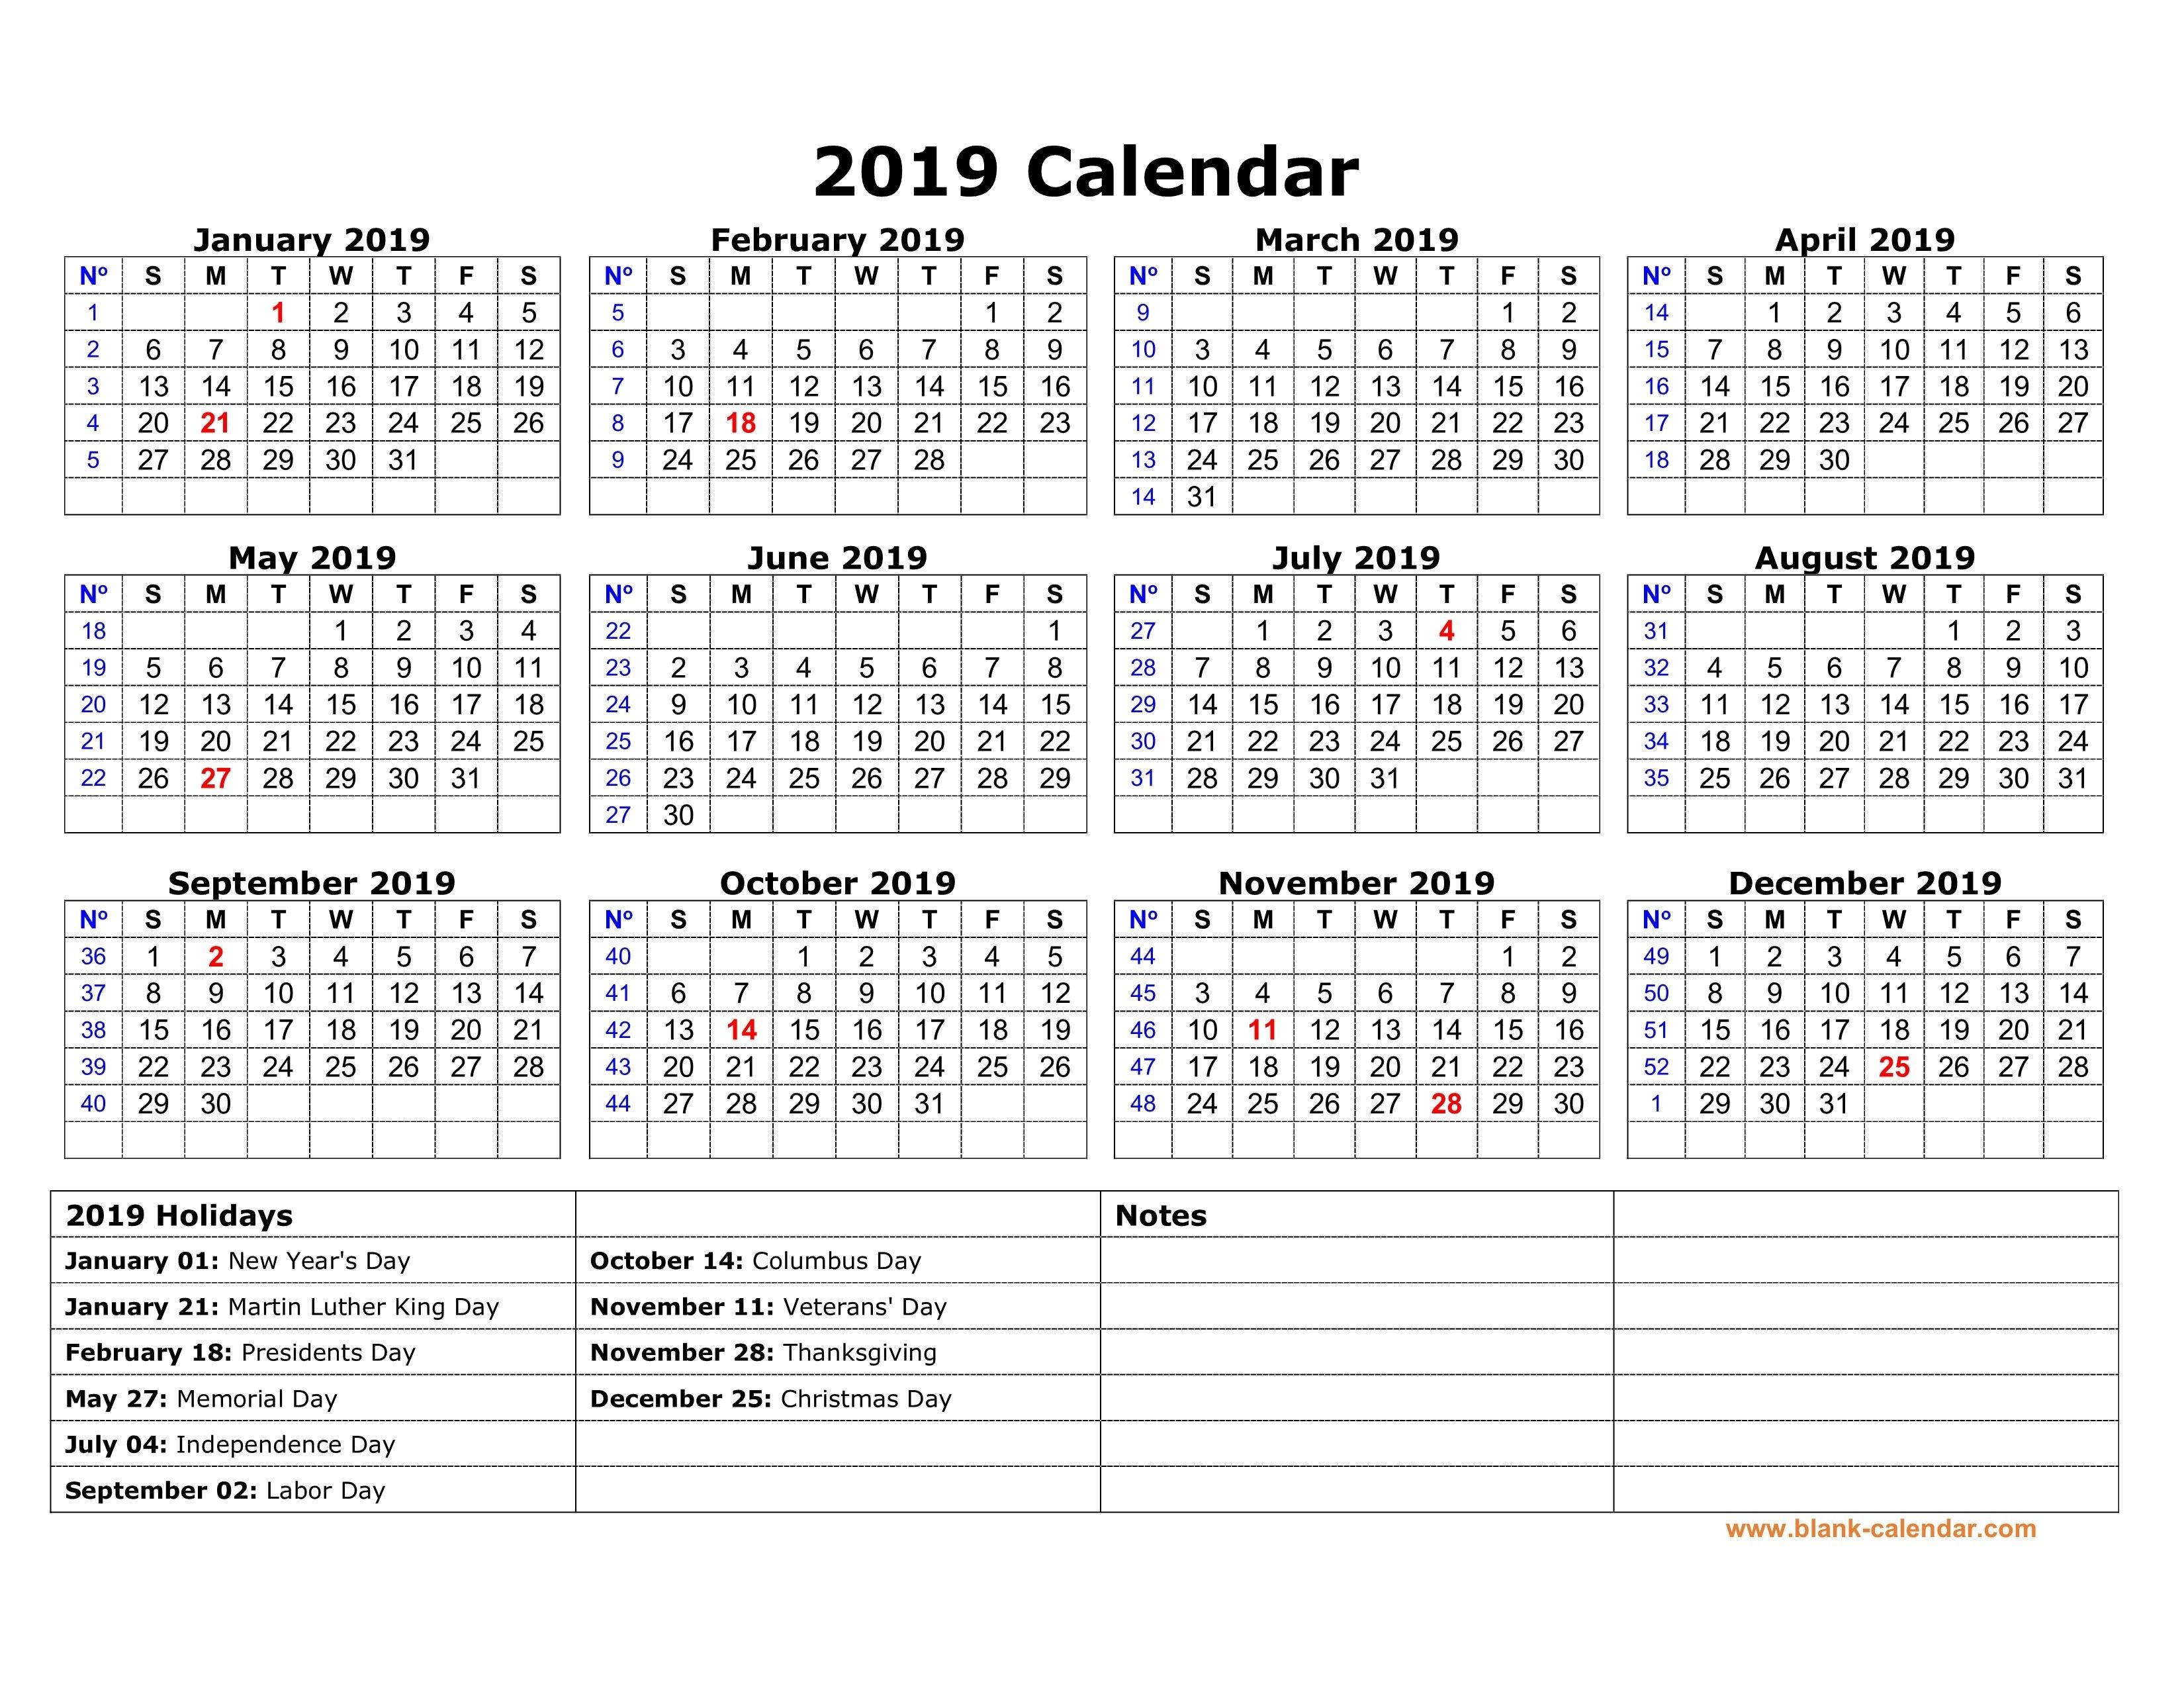 Free Download Printable Calendar 2019 With Us Federal Holidays, One Calendar 2019 Including Holidays